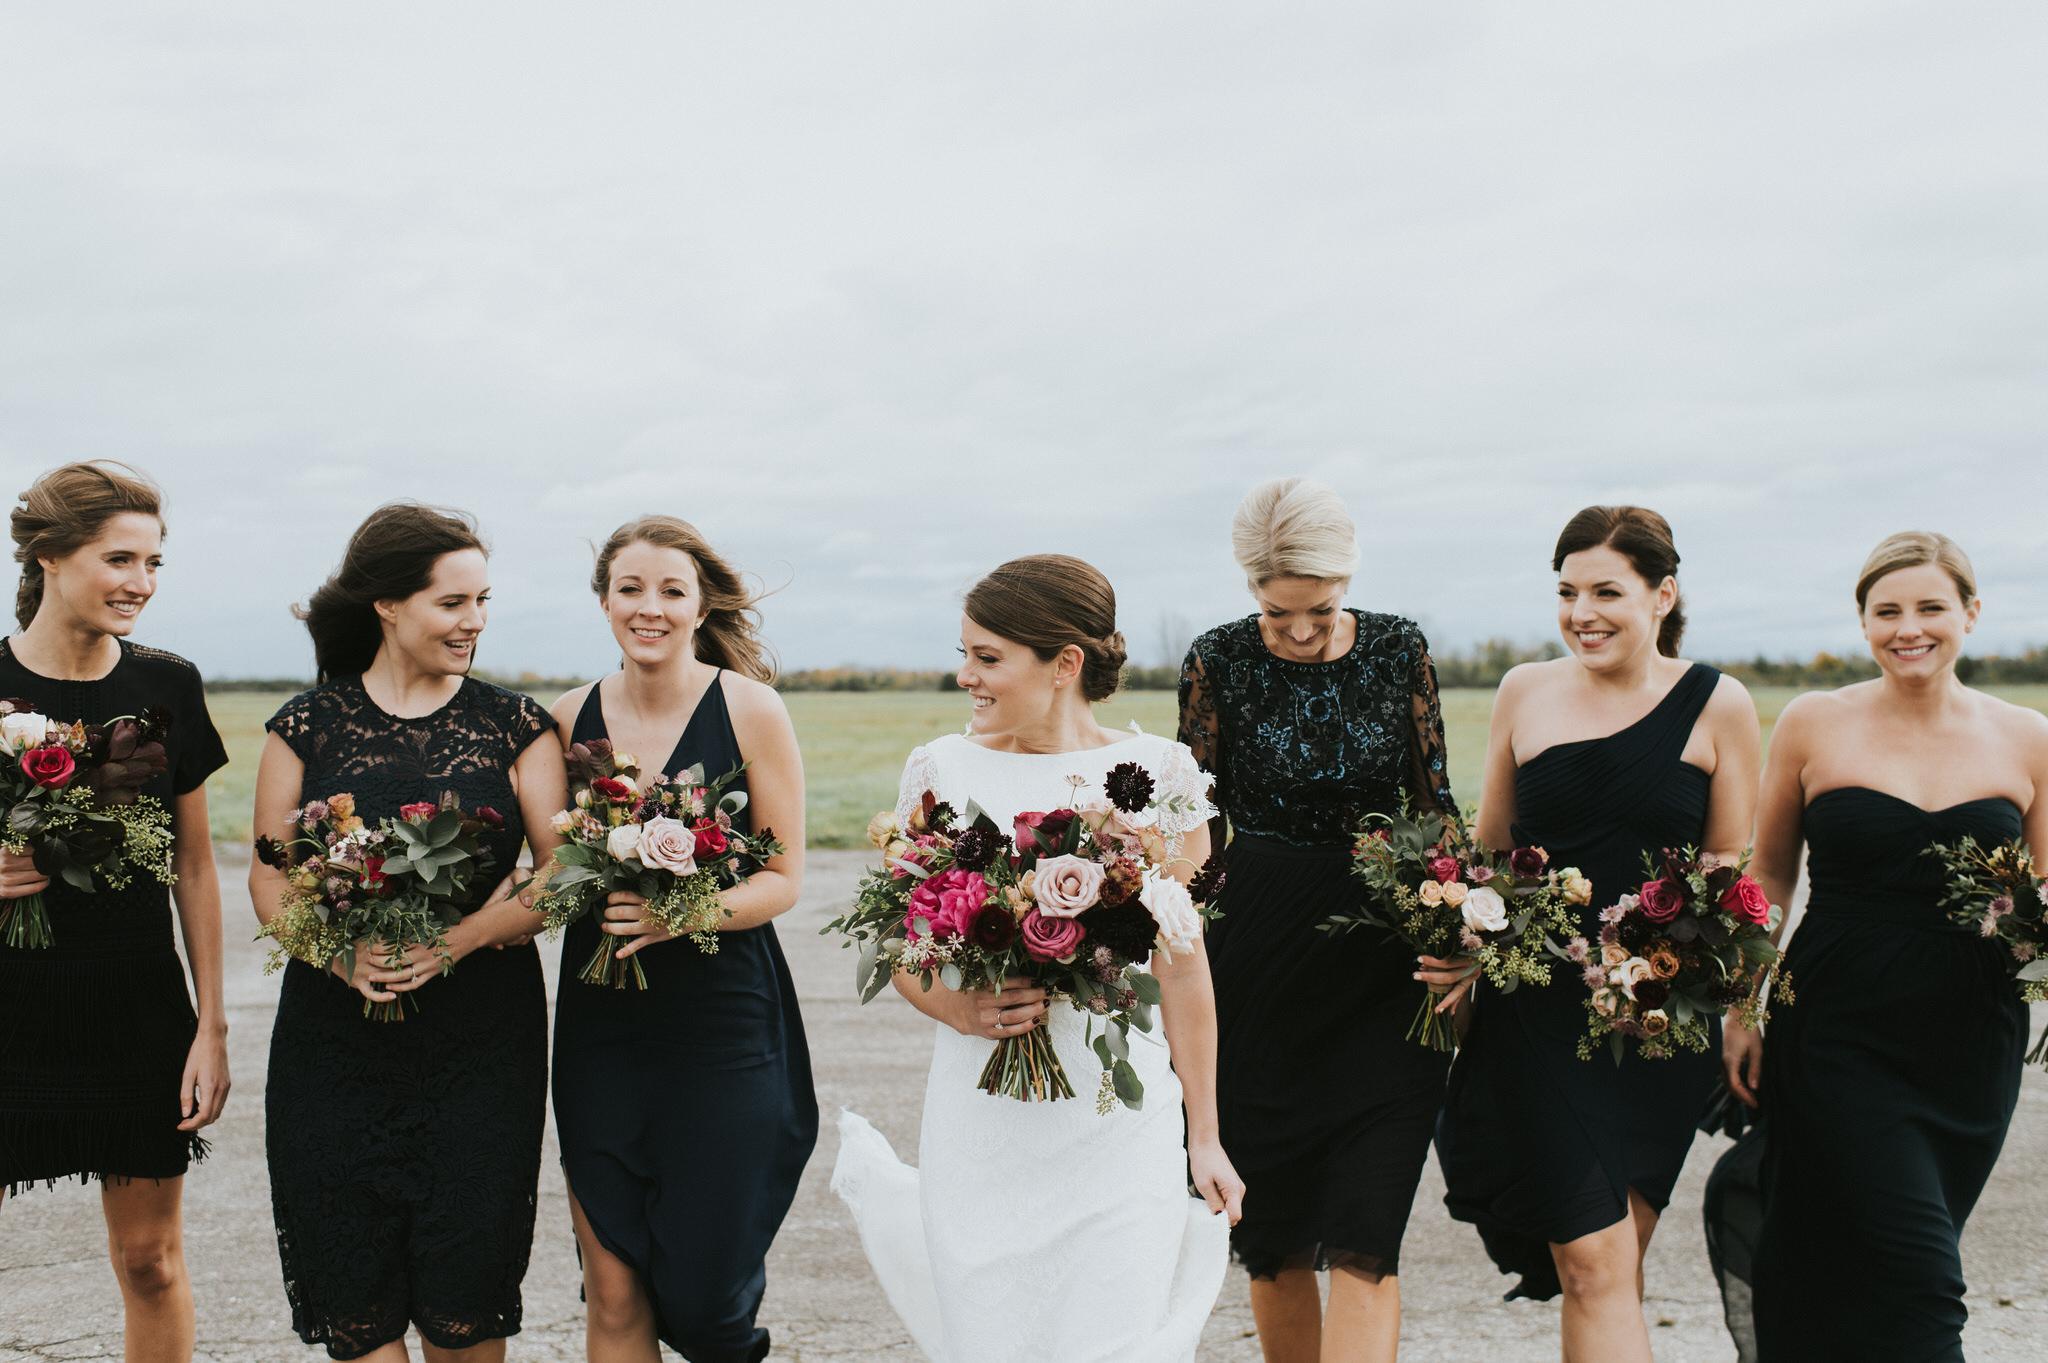 scarletoneillphotography_weddingphotography_prince edward county weddings060.JPG